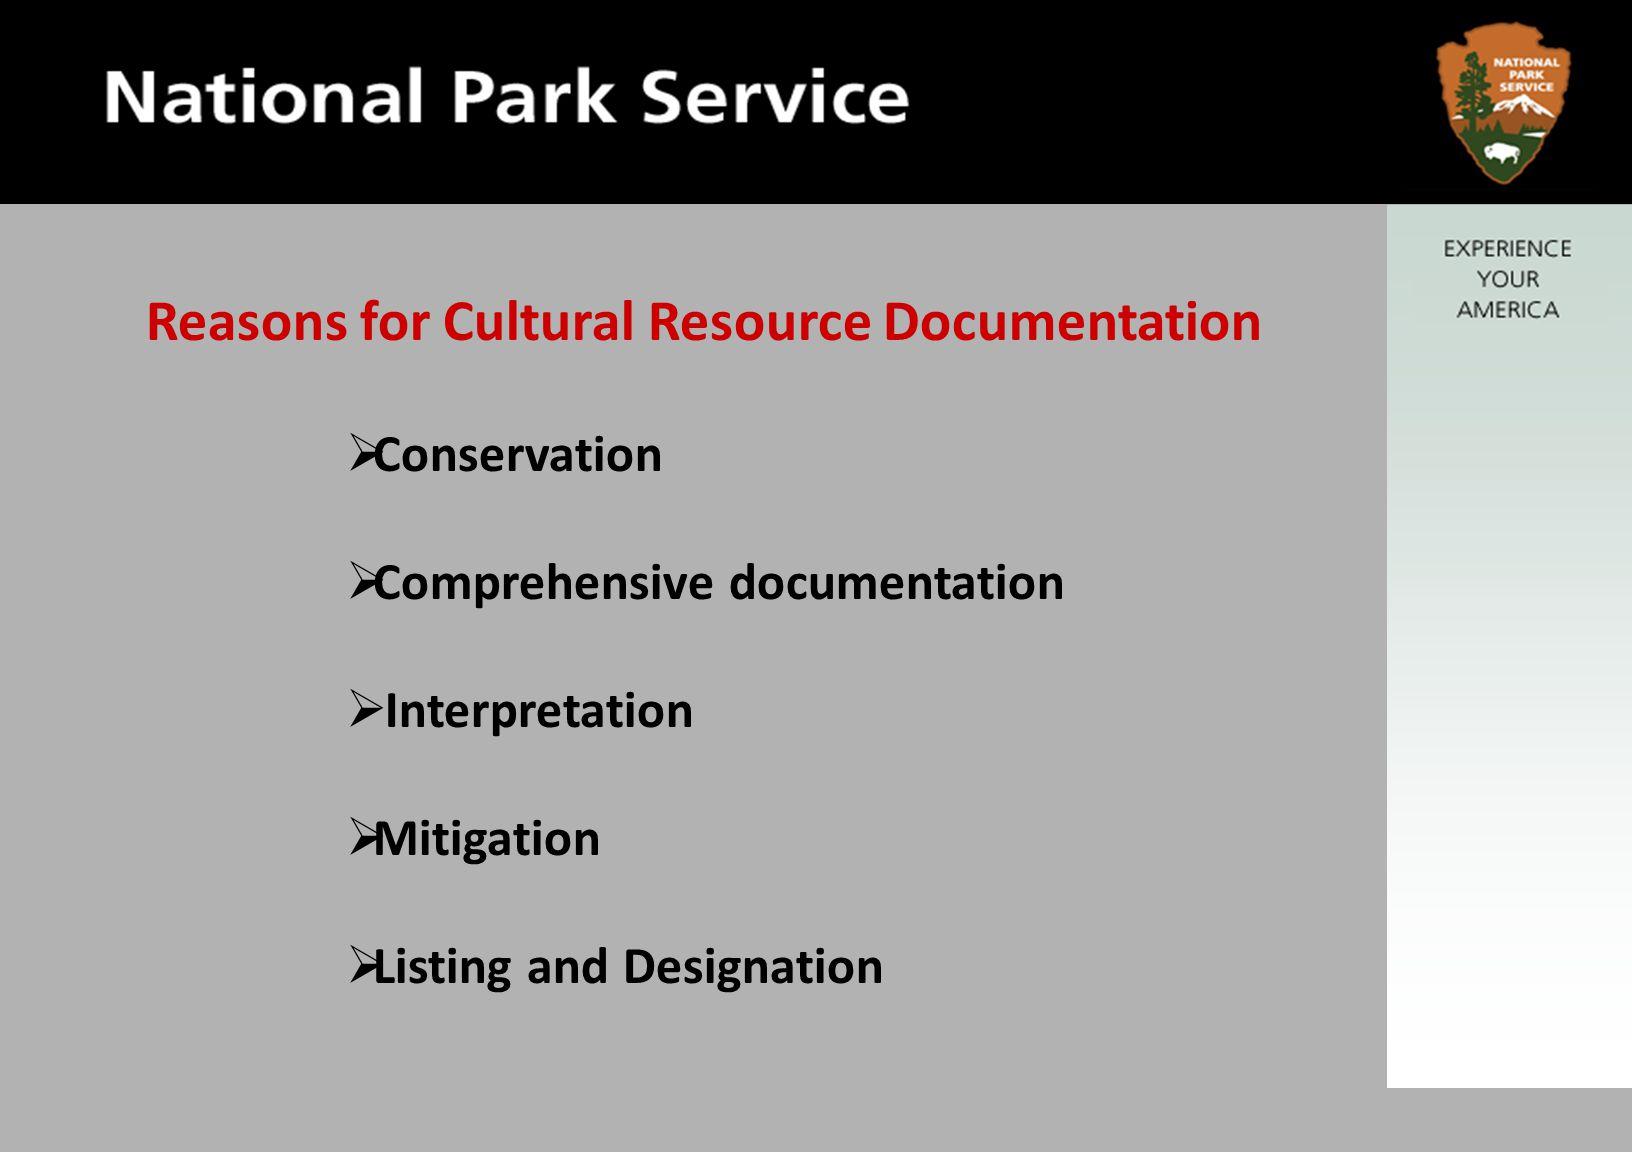  Conservation  Comprehensive documentation  Interpretation  Mitigation  Listing and Designation Reasons for Cultural Resource Documentation